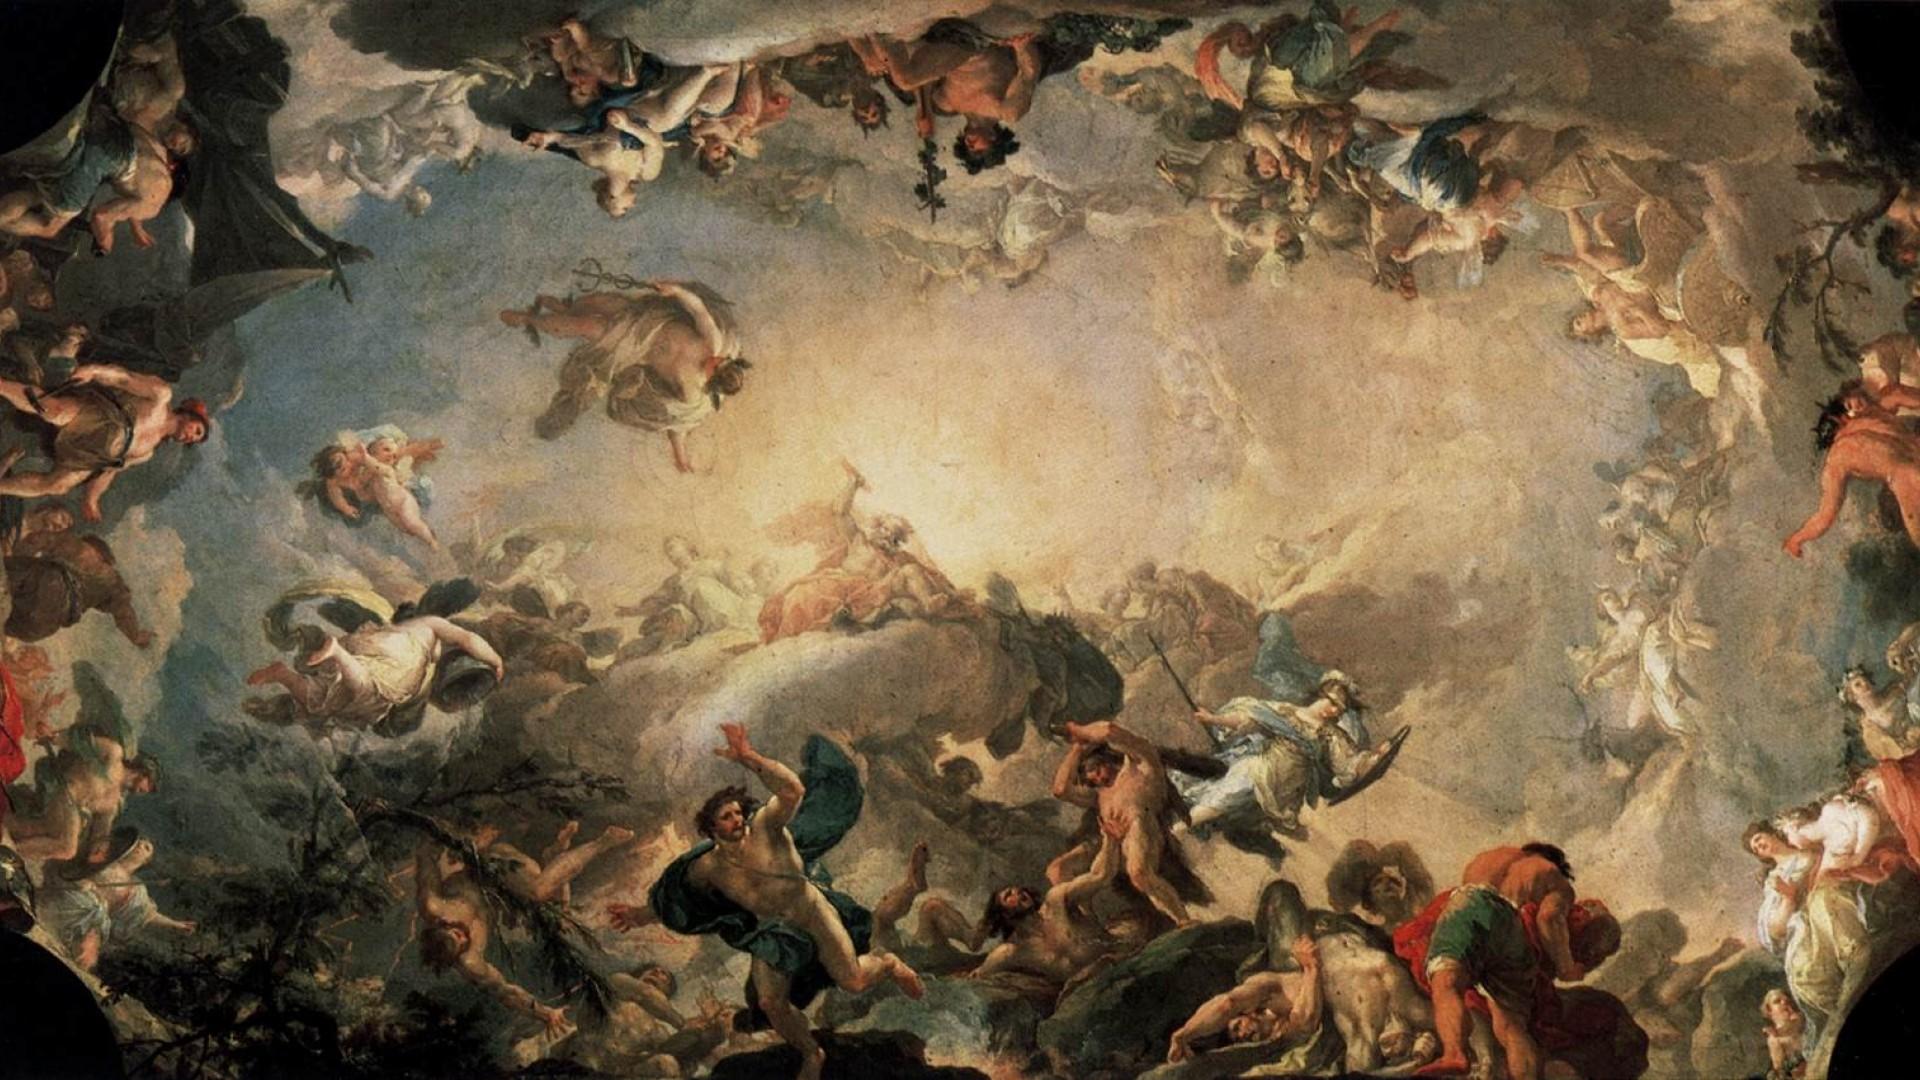 1920x1080 > Mythology Wallpapers